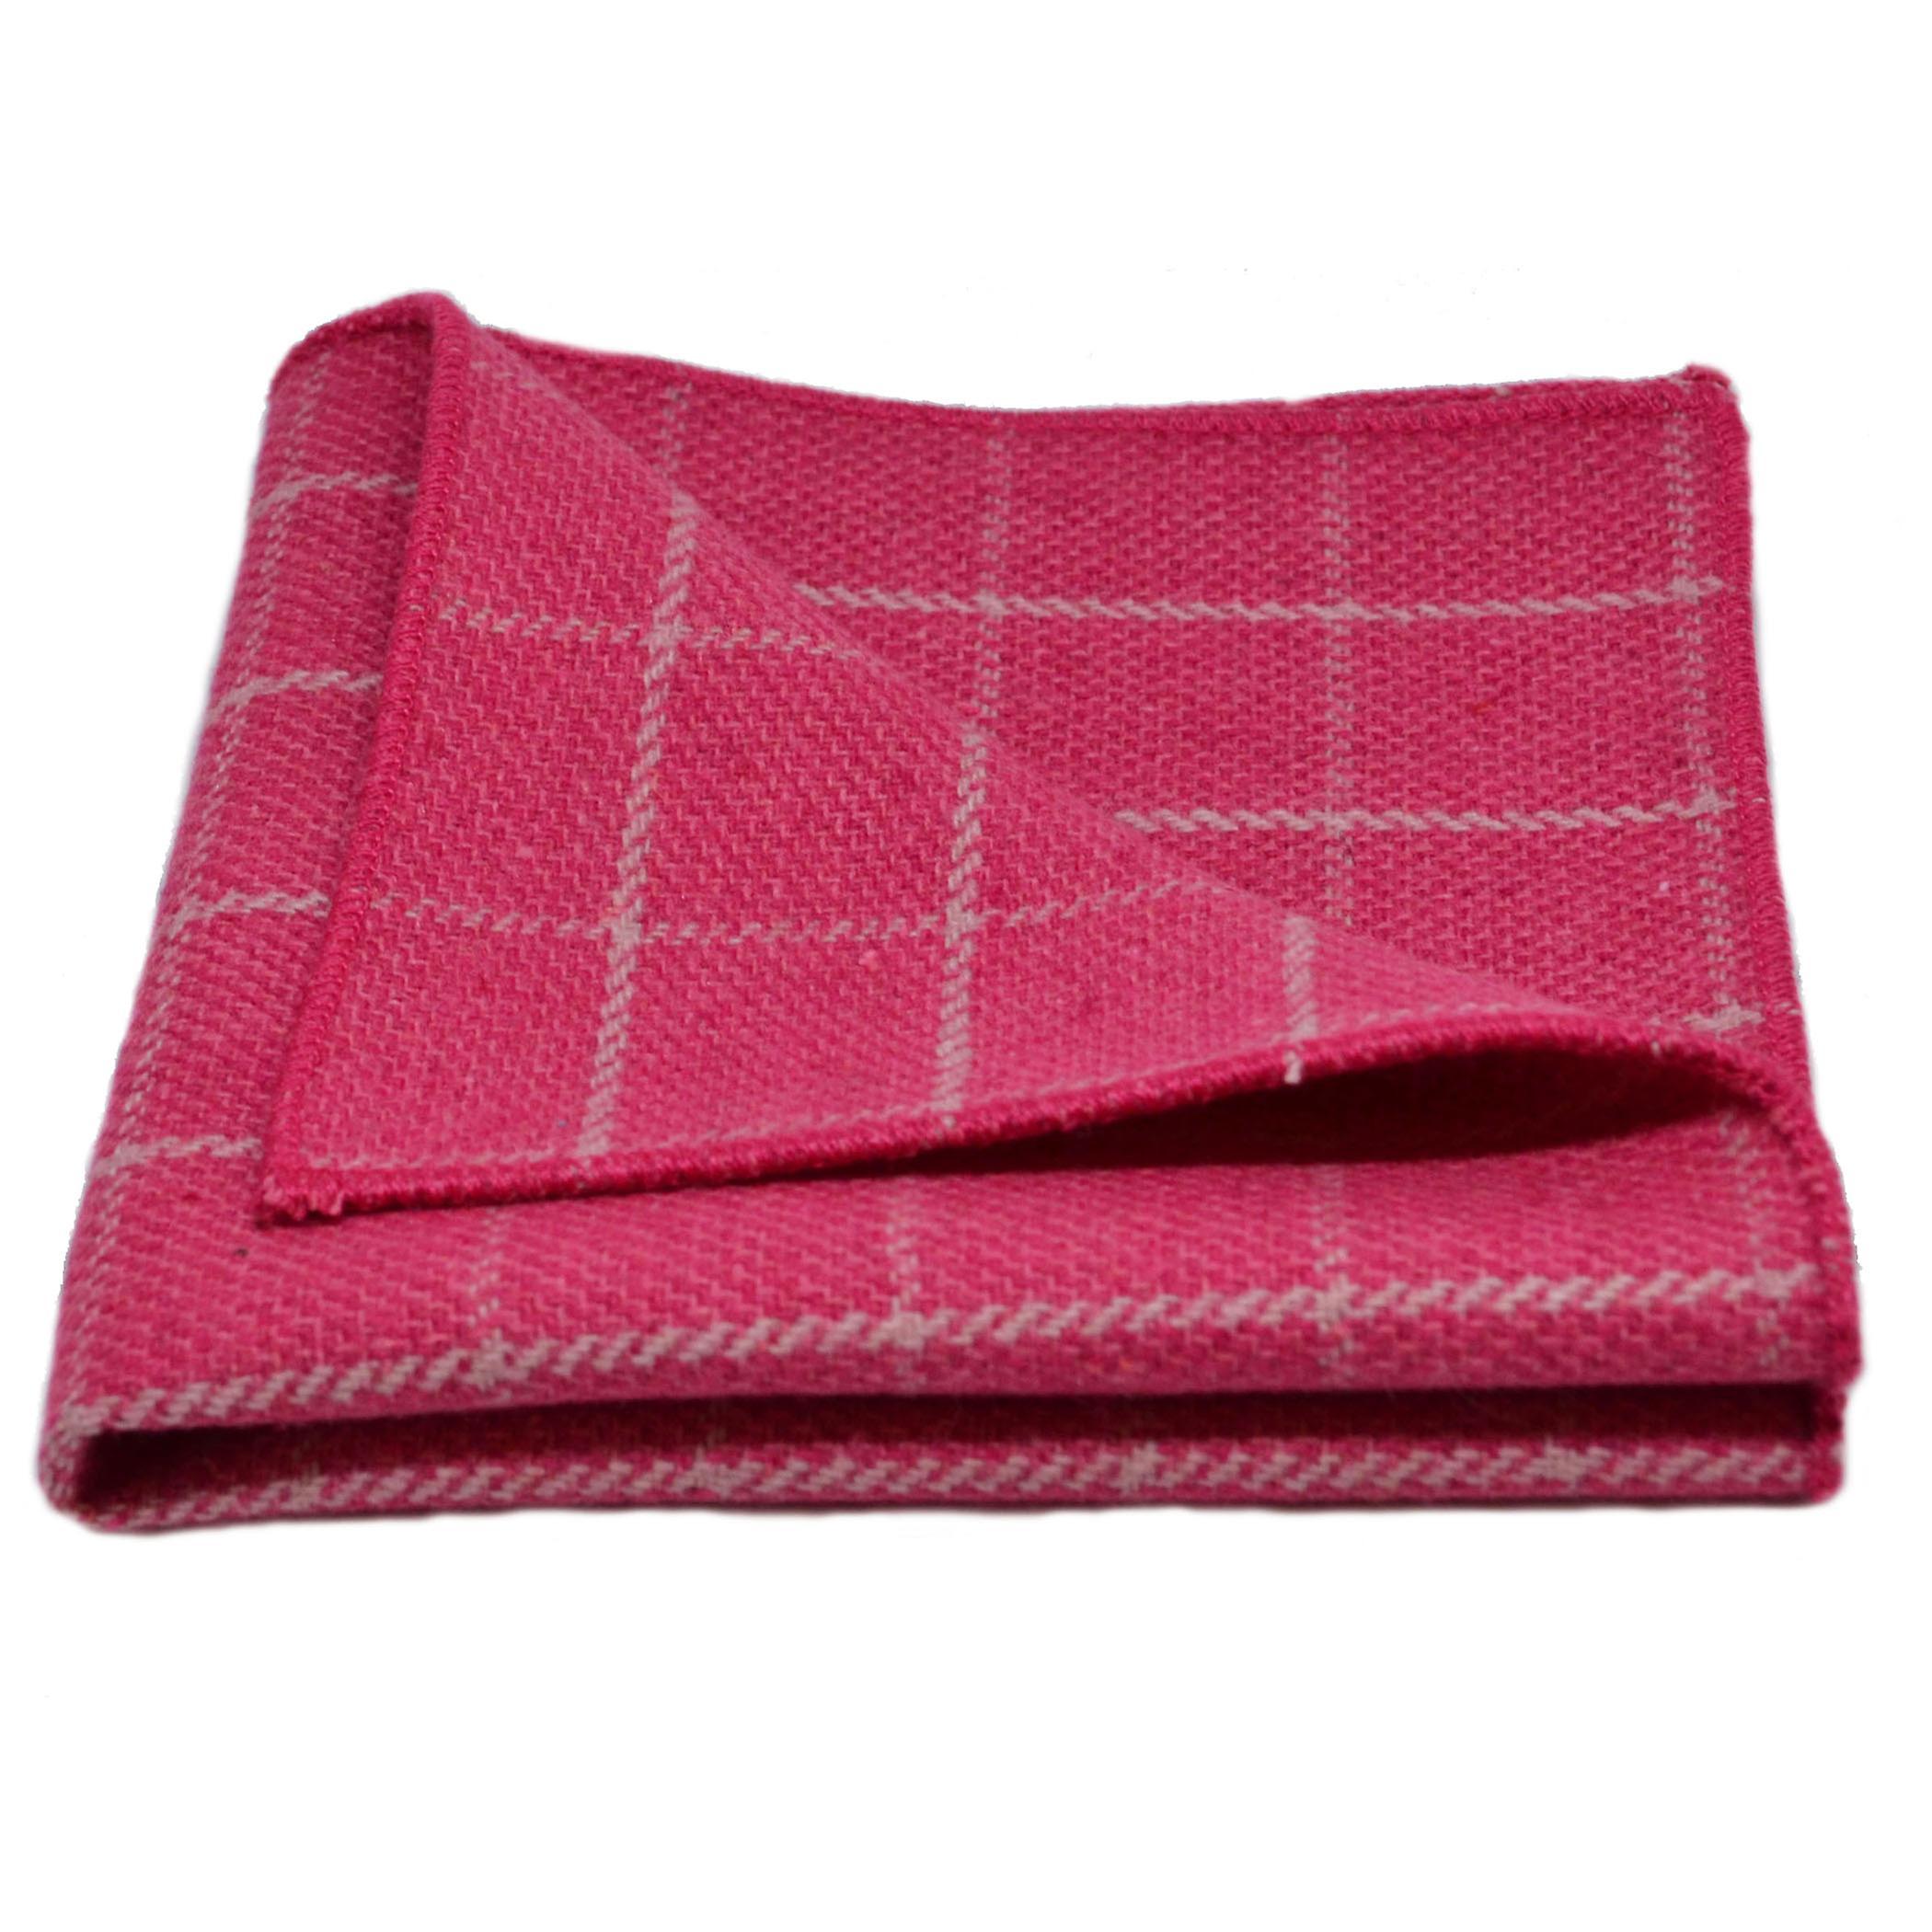 Fuchsia Pink Birdseye Check Pocket Square, Handkerchief